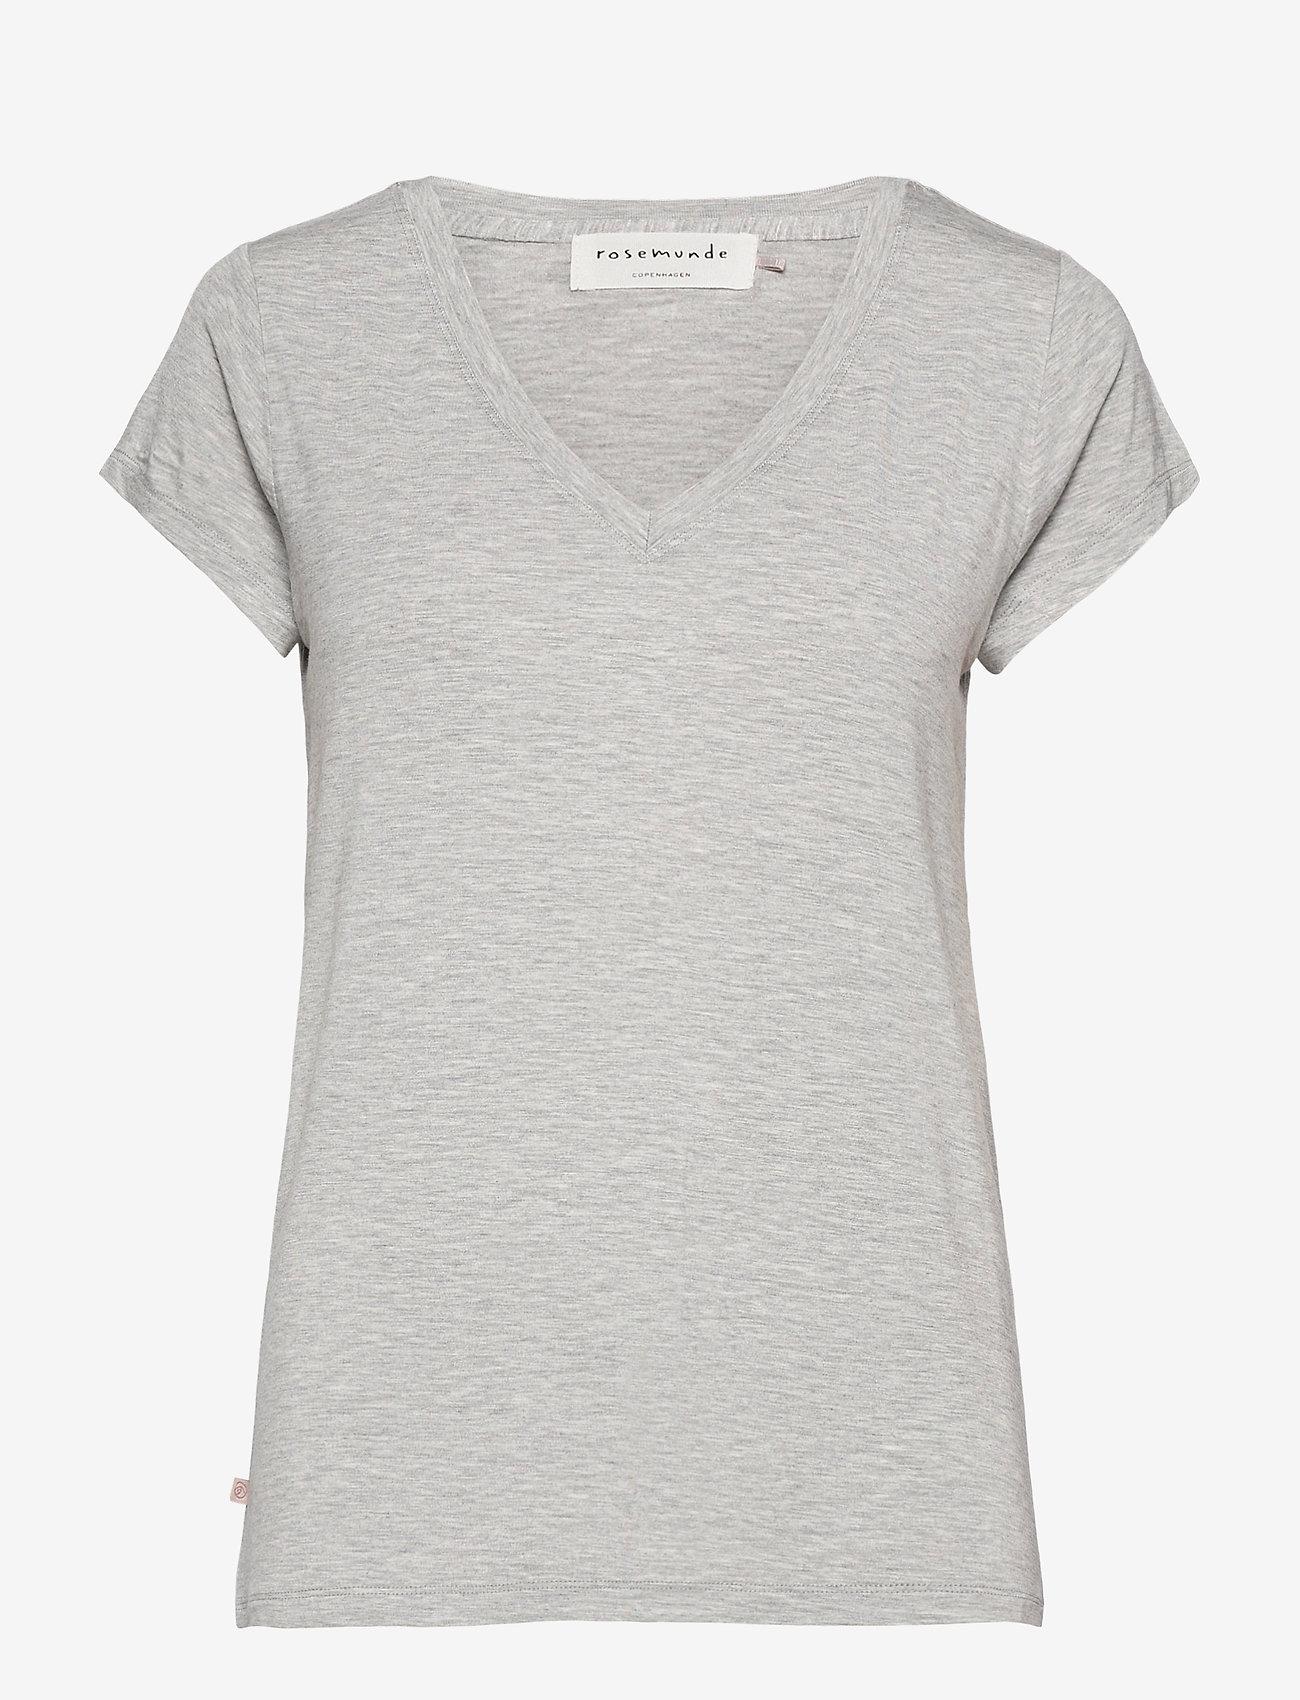 Rosemunde - T-shirt ss - t-shirts - light grey melange - 0